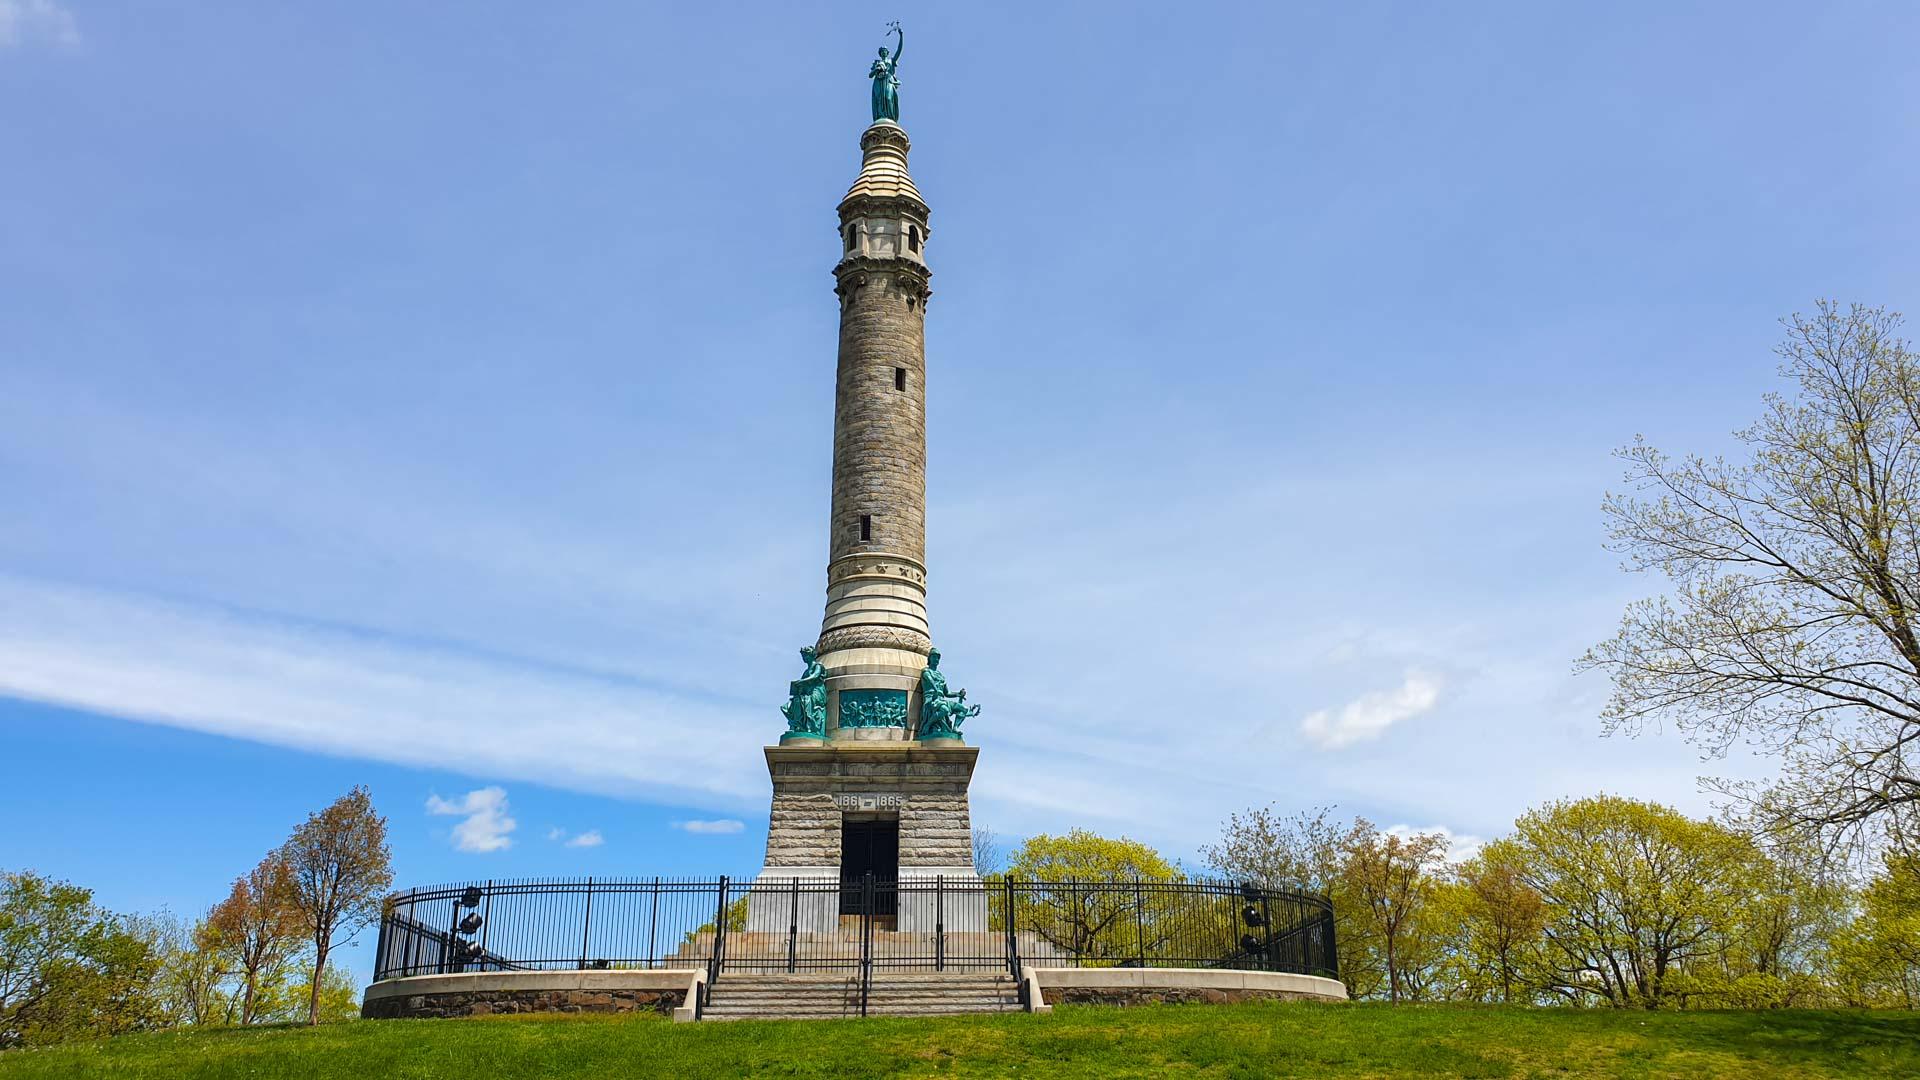 Soldiers' and Sailors' Monument (Monumento a los Soldados y Marineros), East Rock Park, New Haven, Connecticut